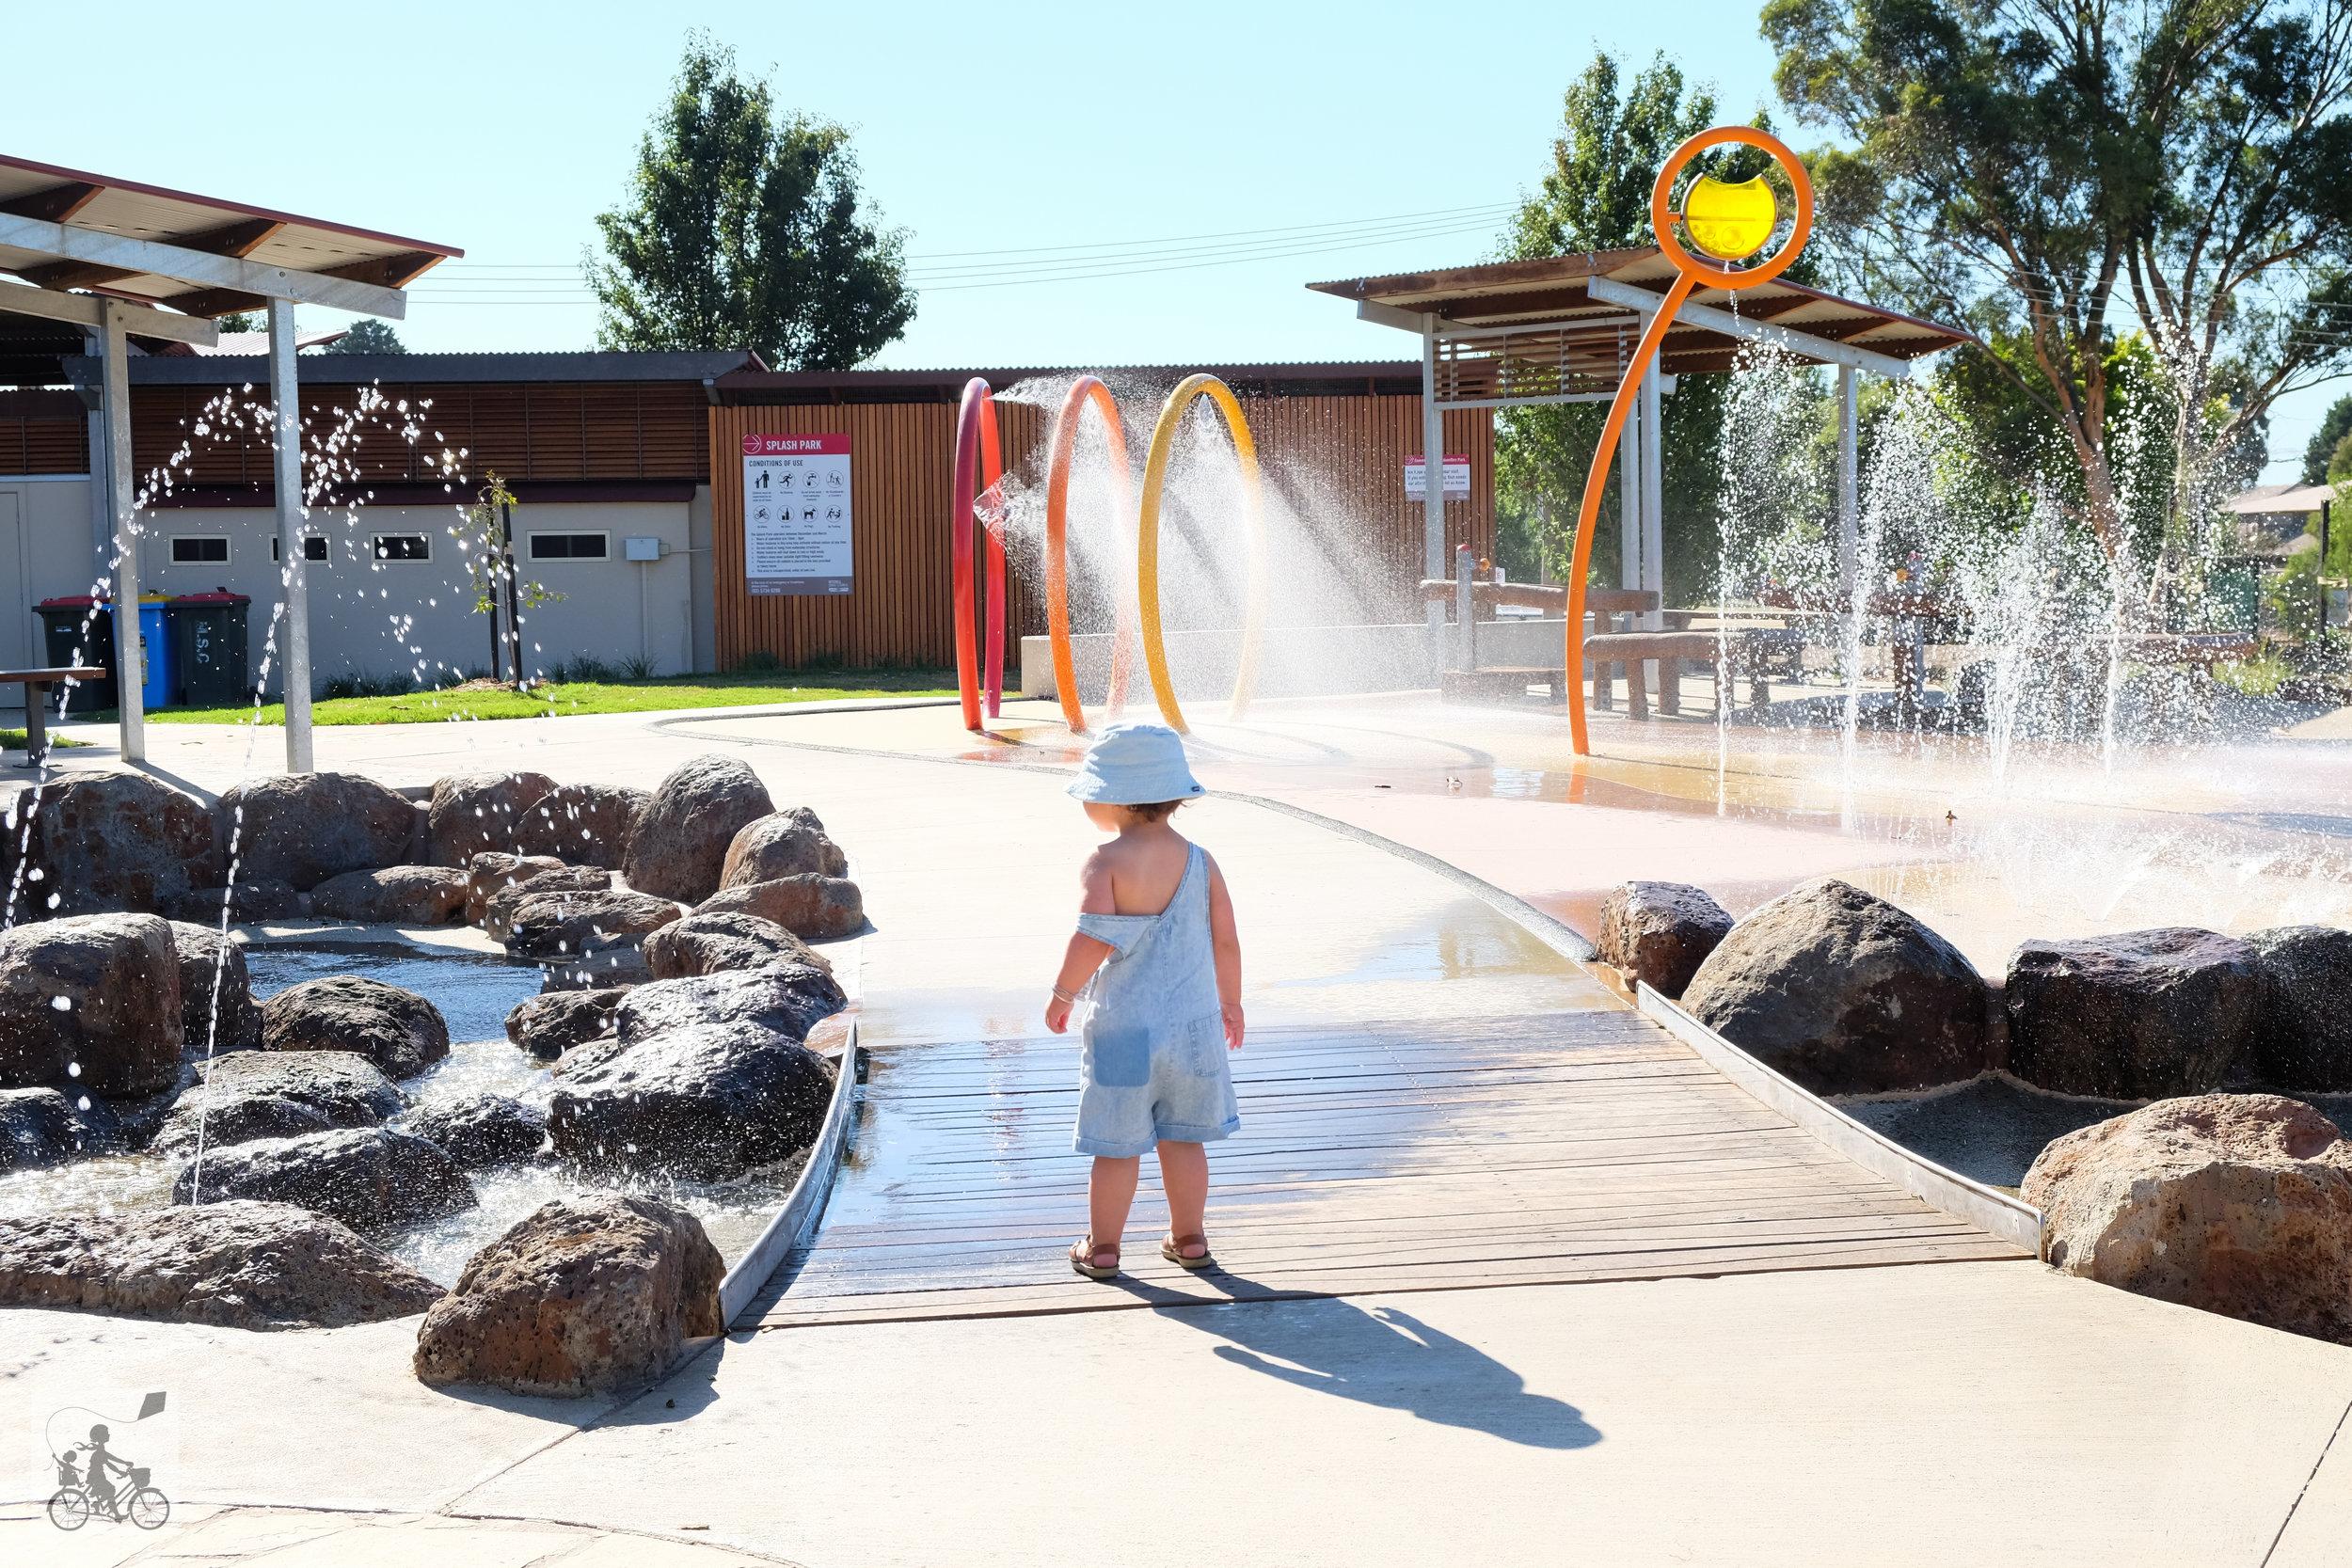 hadfield water park, wallan - mamma knows north